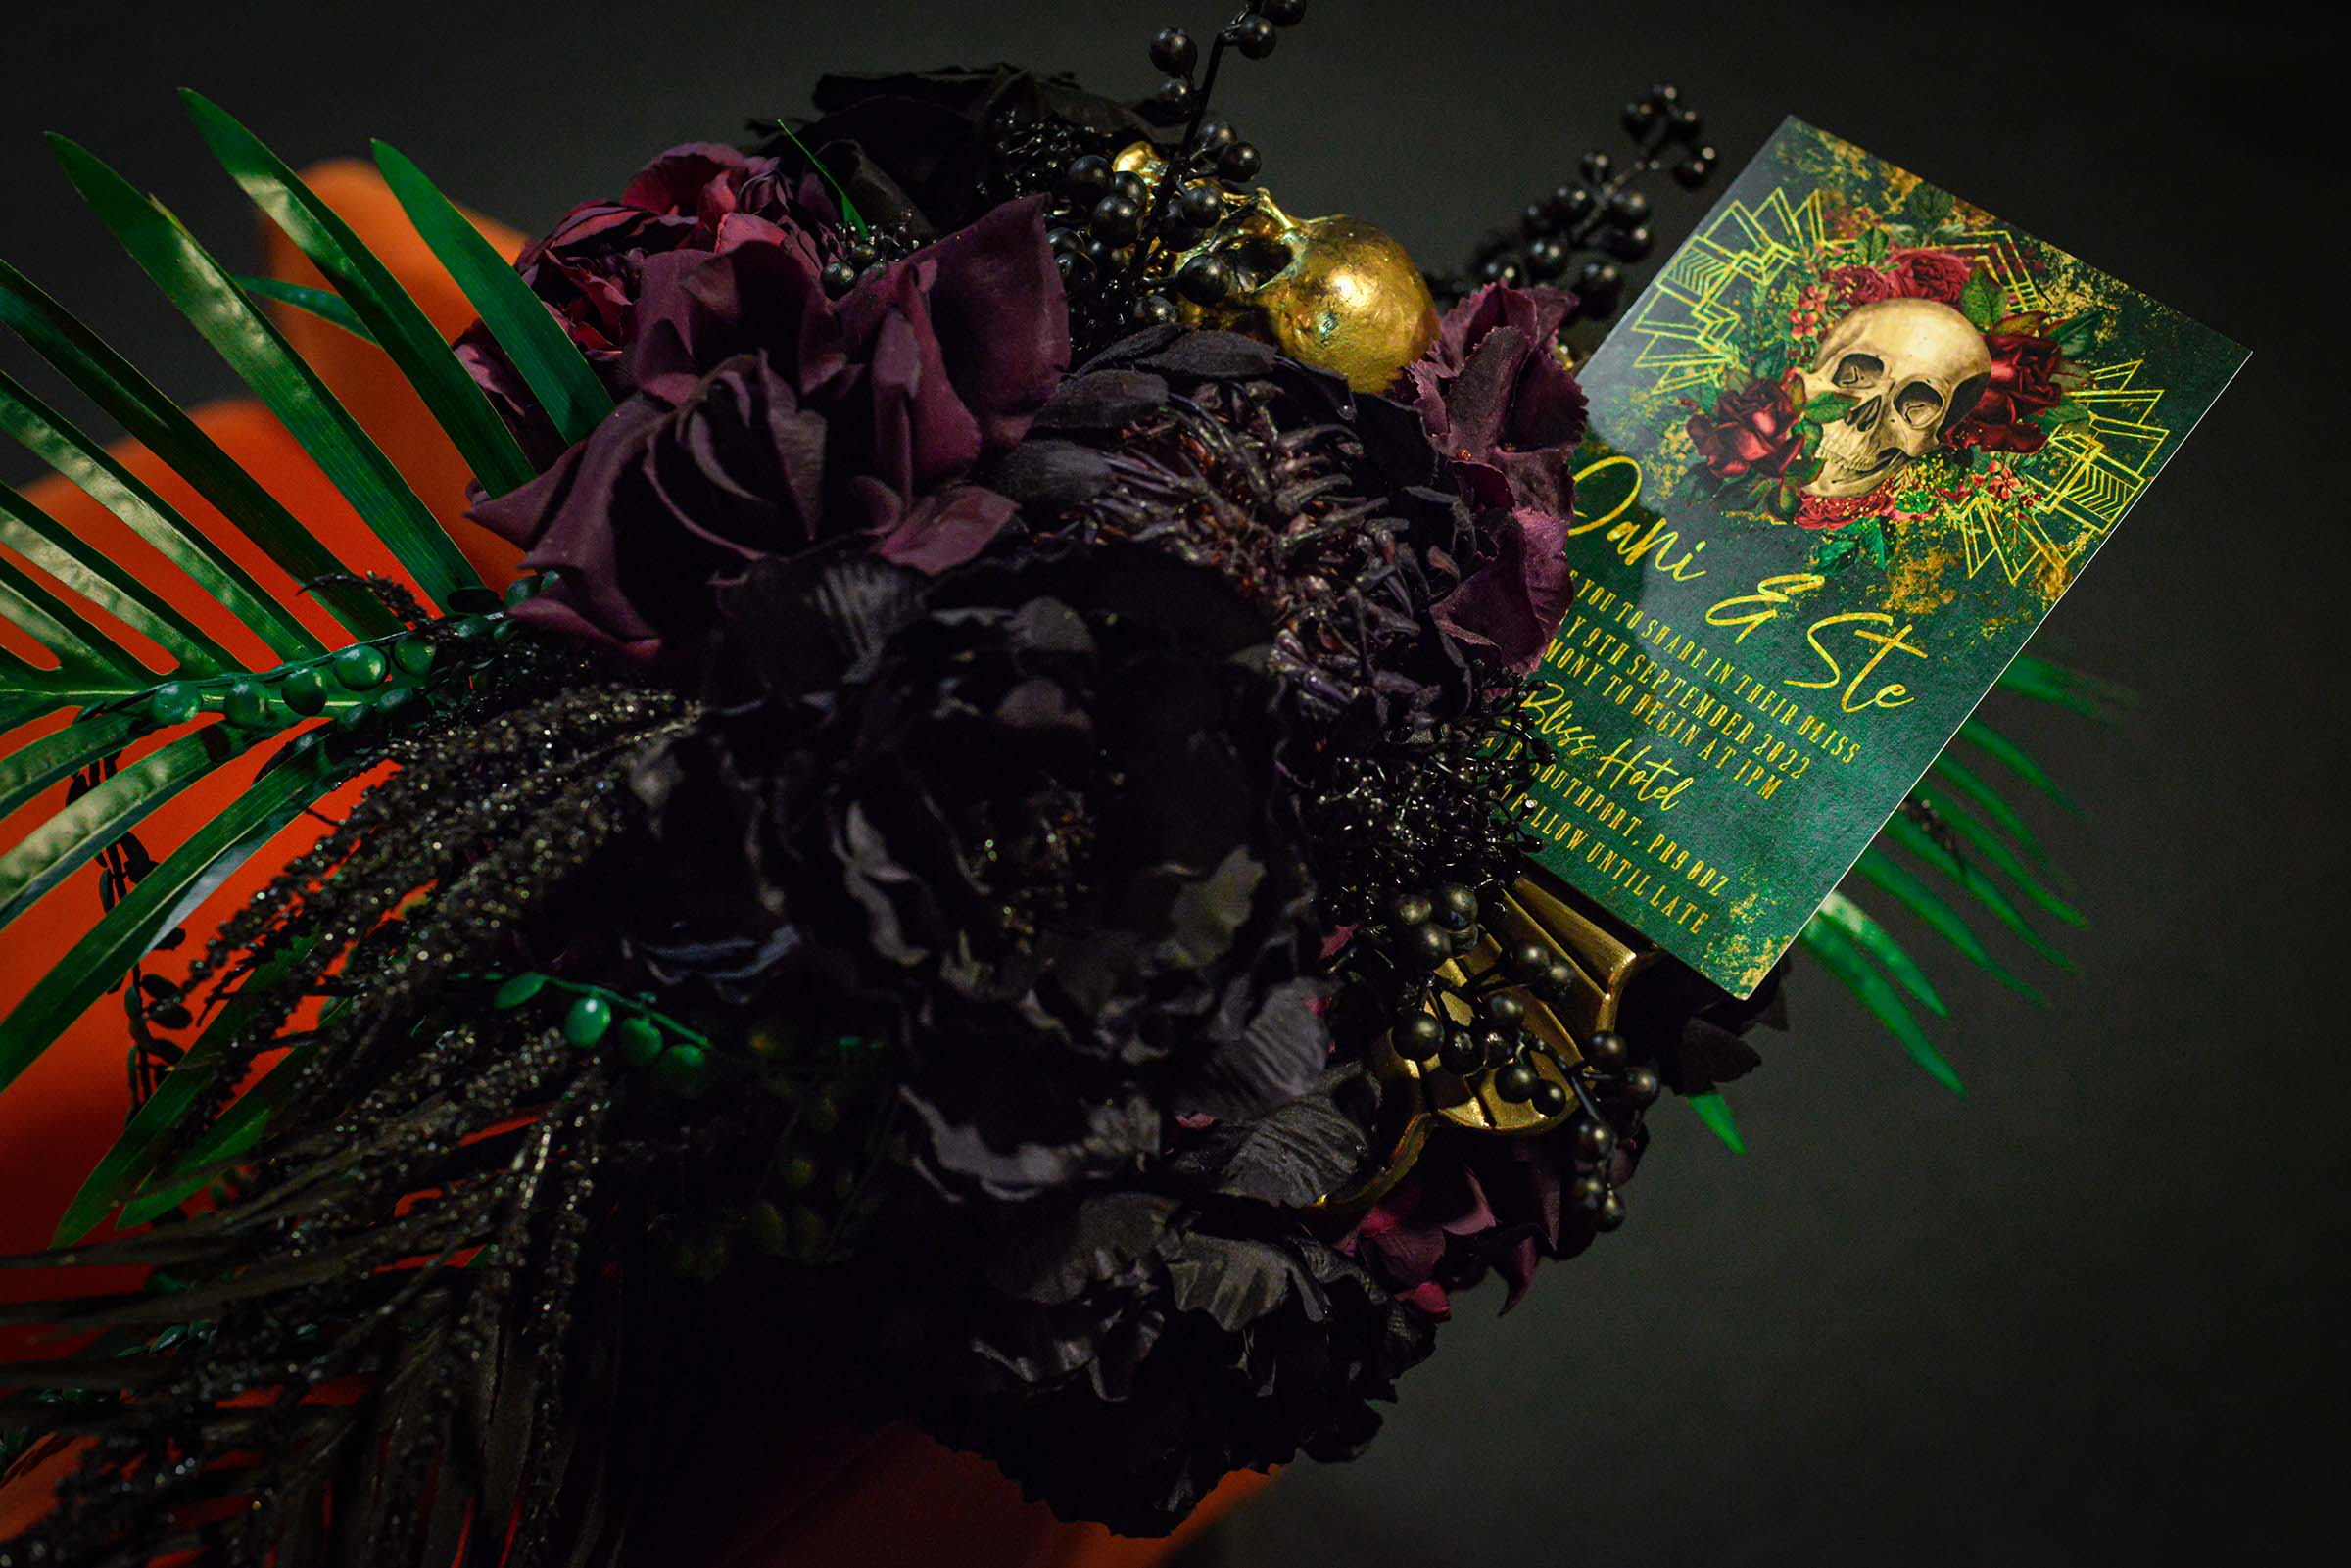 alternative luxe wedding - slytherin wedding - gothic wedding - alternative wedding - gothic wedding bouquet - alternative wedding bouquet - gothic wedding stationery